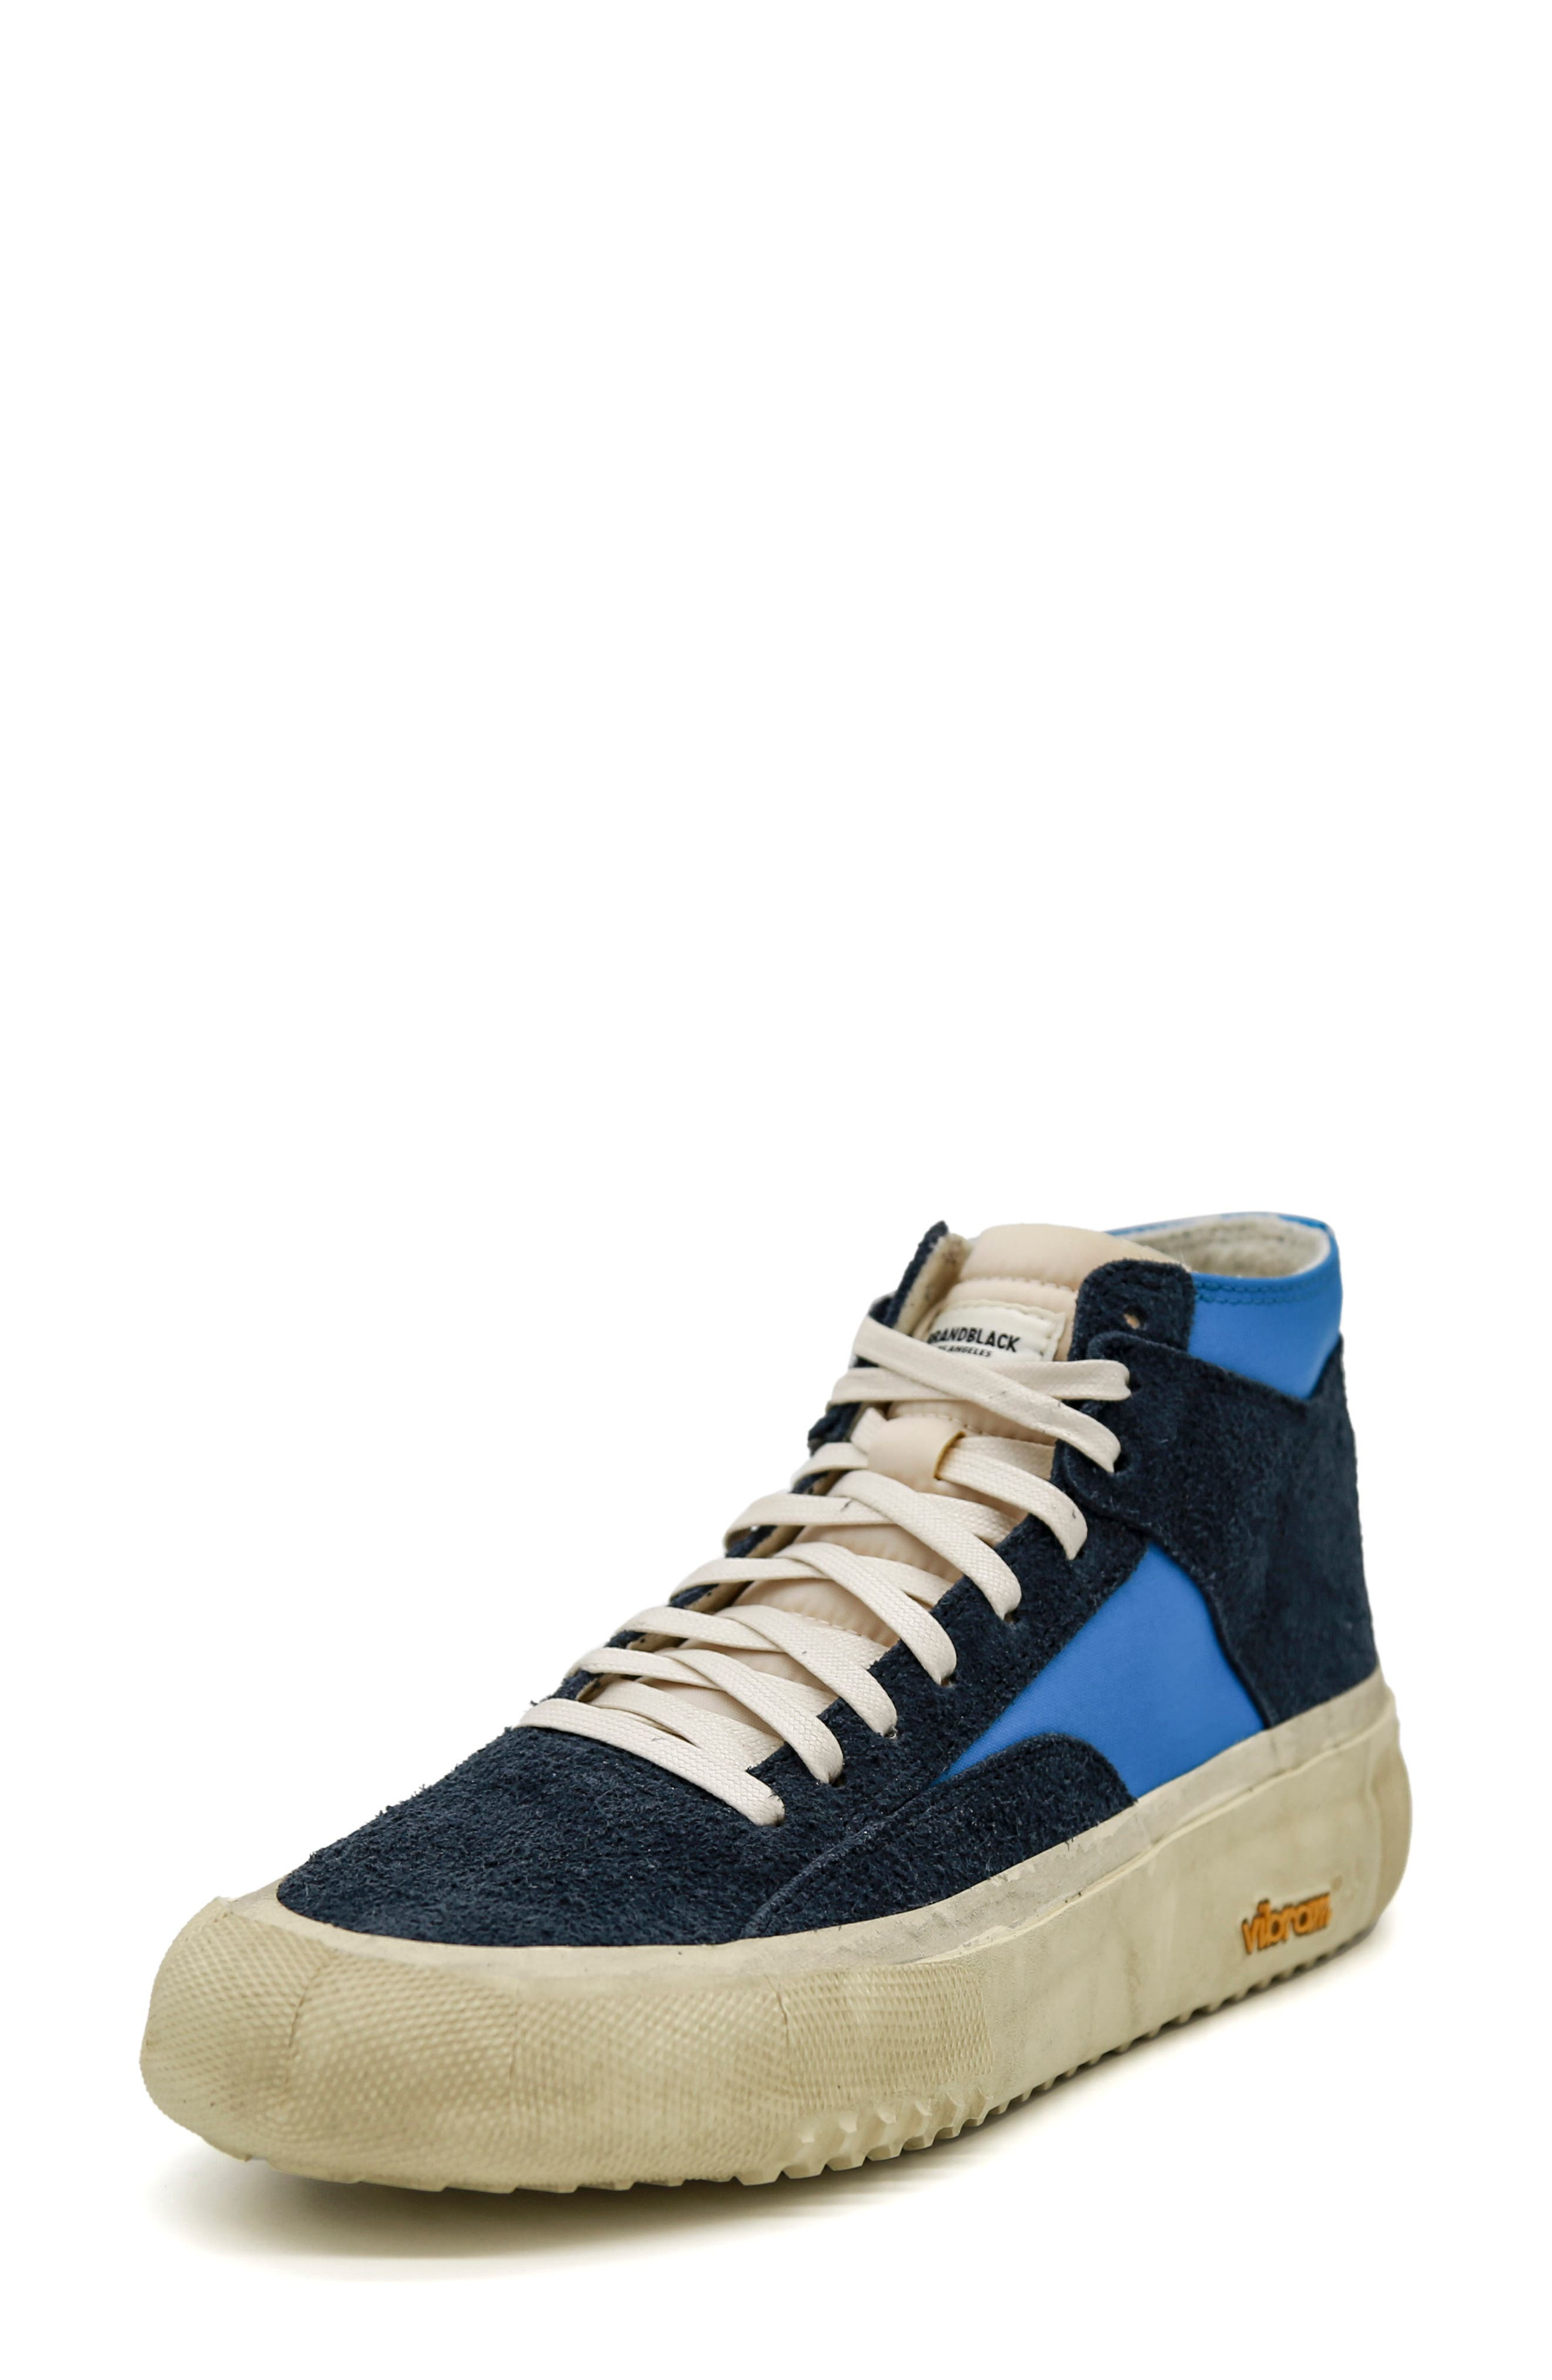 Capo Dirty High Top Sneaker